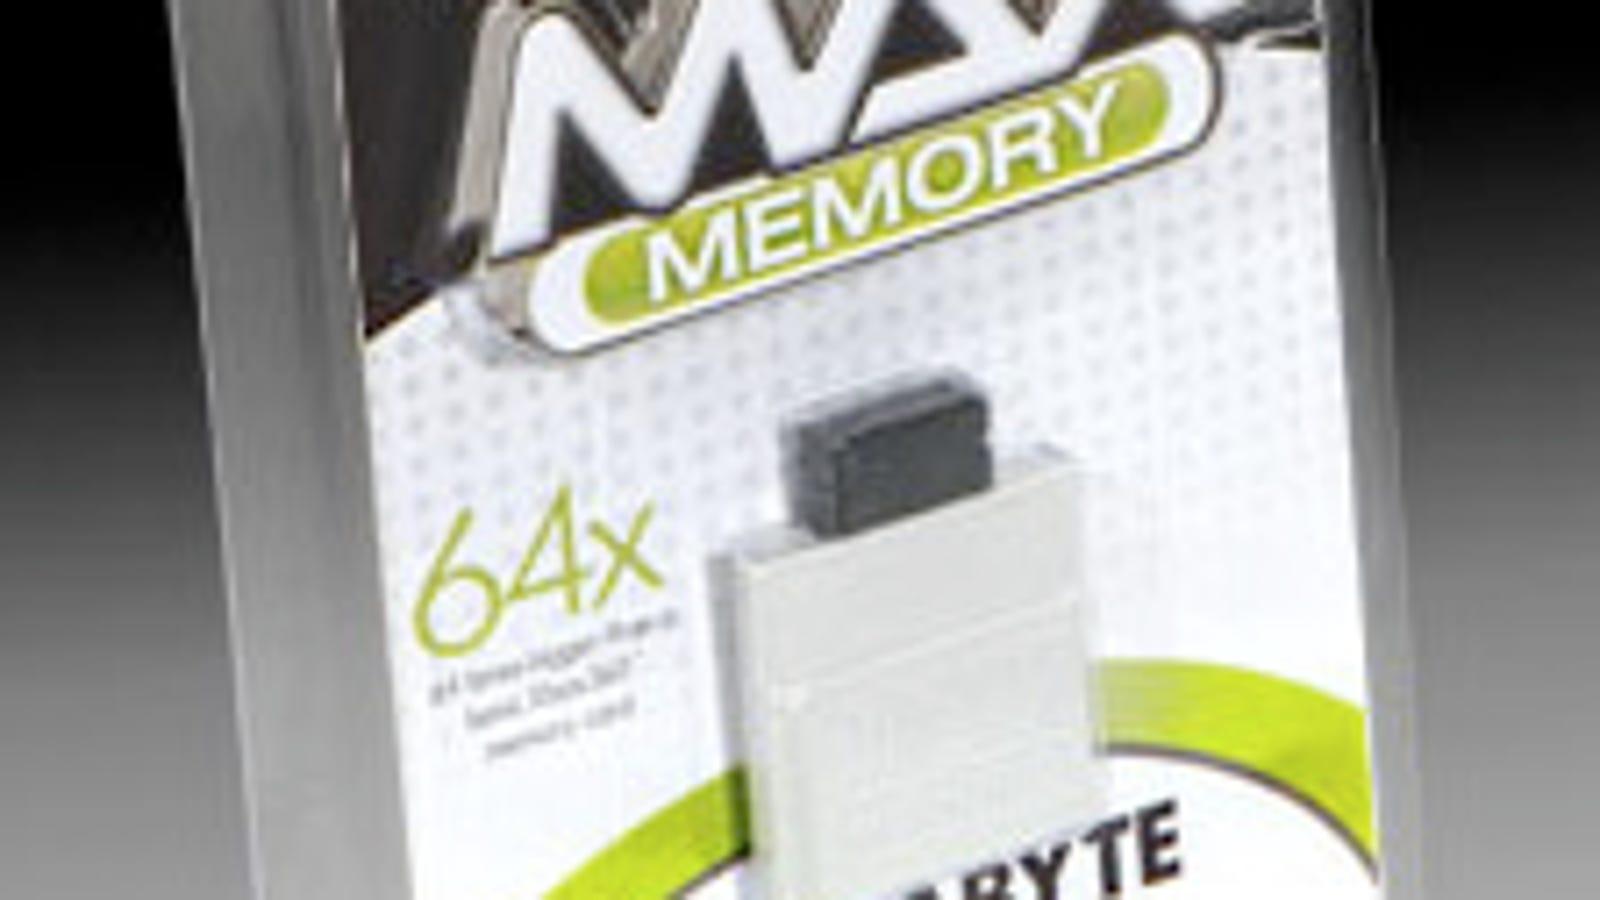 DATEL XBOX MEMORY CARD DRIVERS FOR WINDOWS MAC